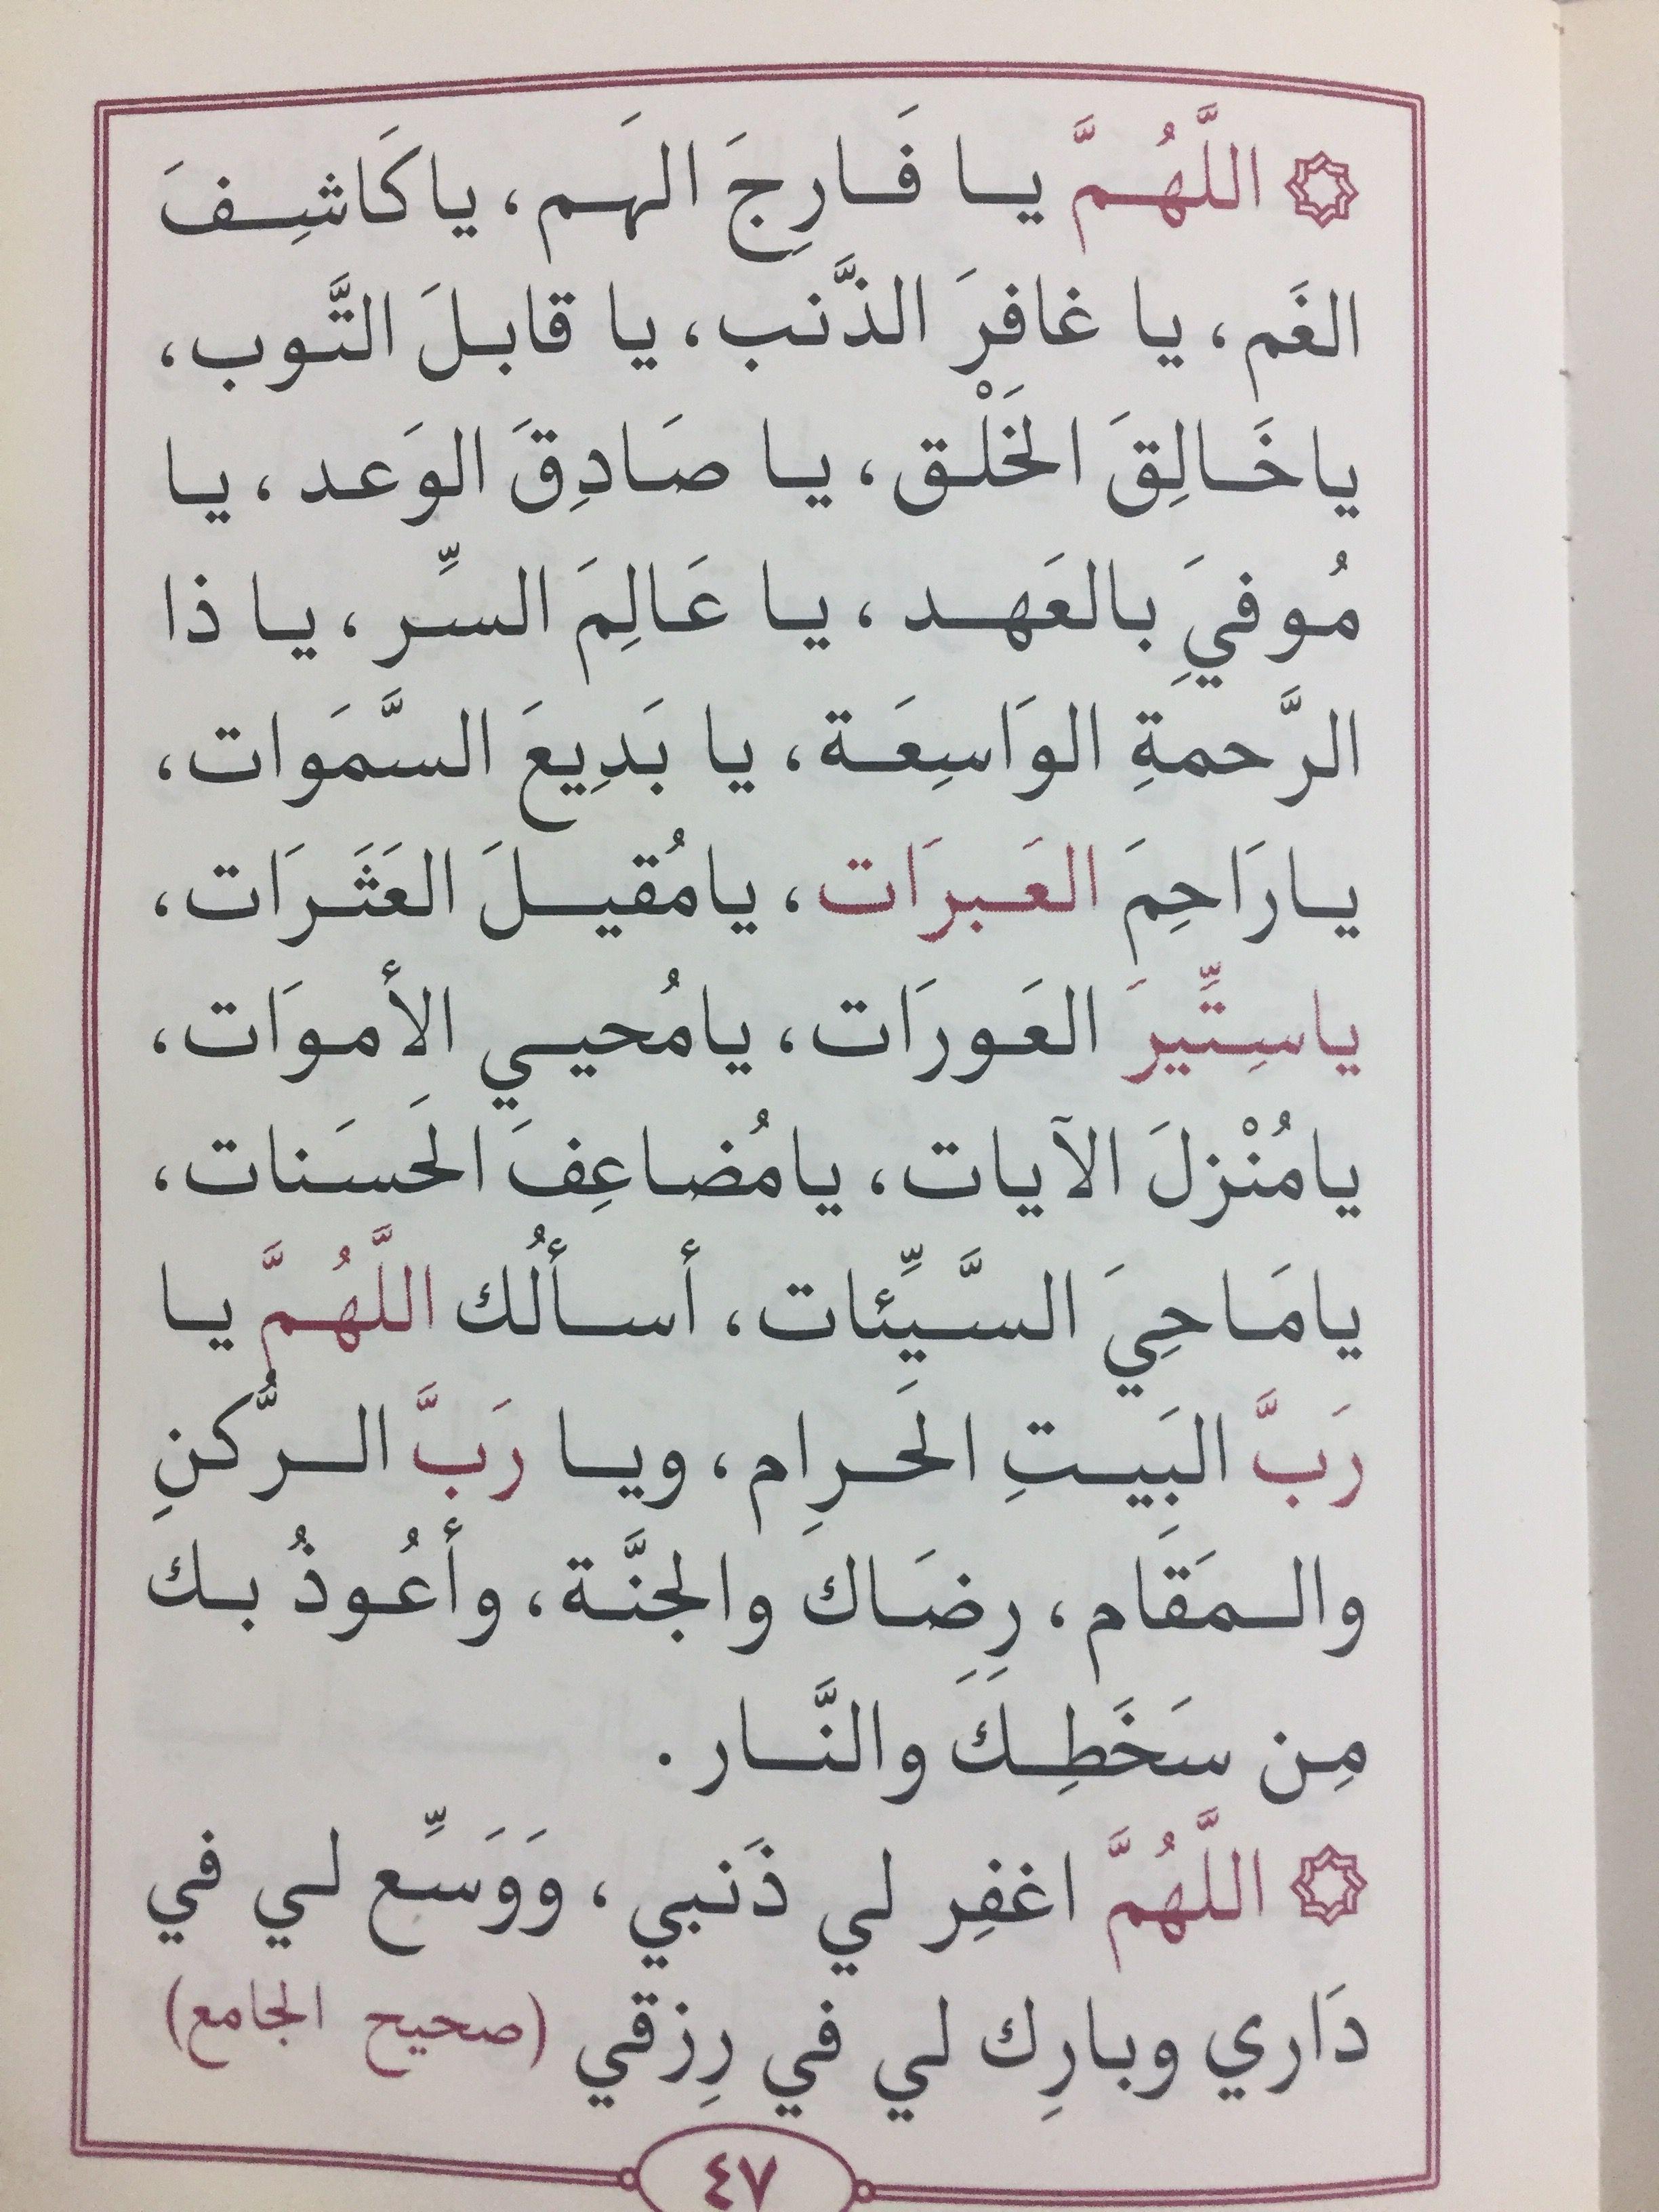 الله يرحمك و يسكنك ابواب الجنه Islamic Love Quotes Quran Quotes Love Islamic Inspirational Quotes